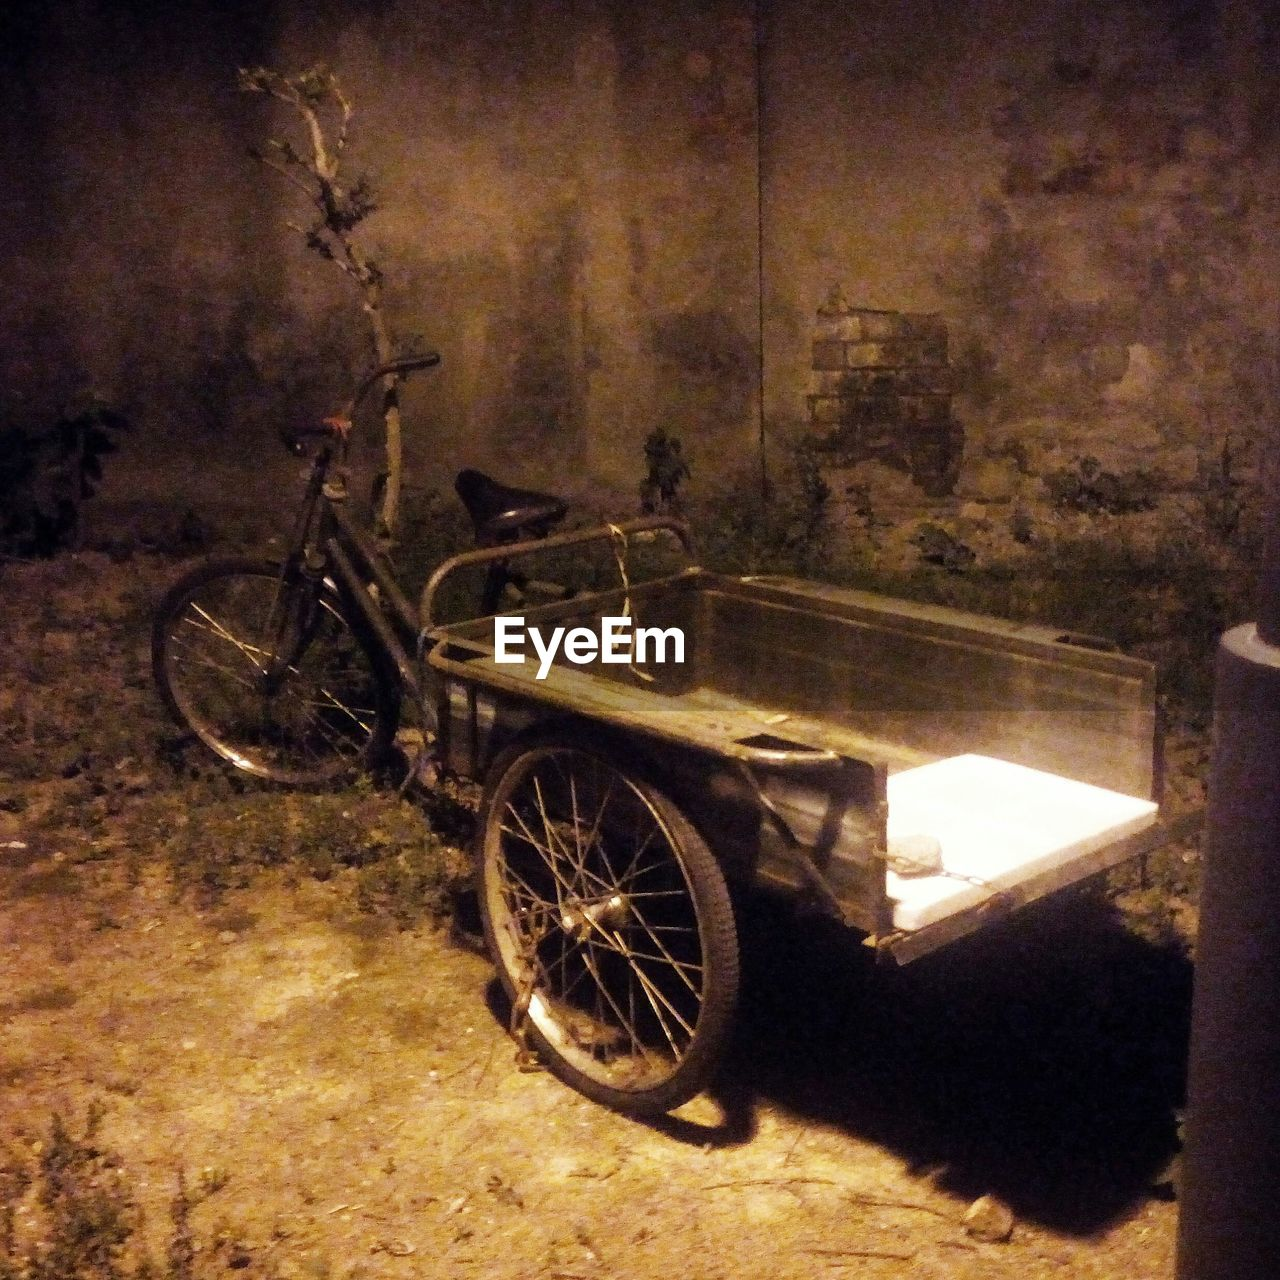 transportation, mode of transport, land vehicle, wheel, abandoned, no people, stationary, night, old-fashioned, outdoors